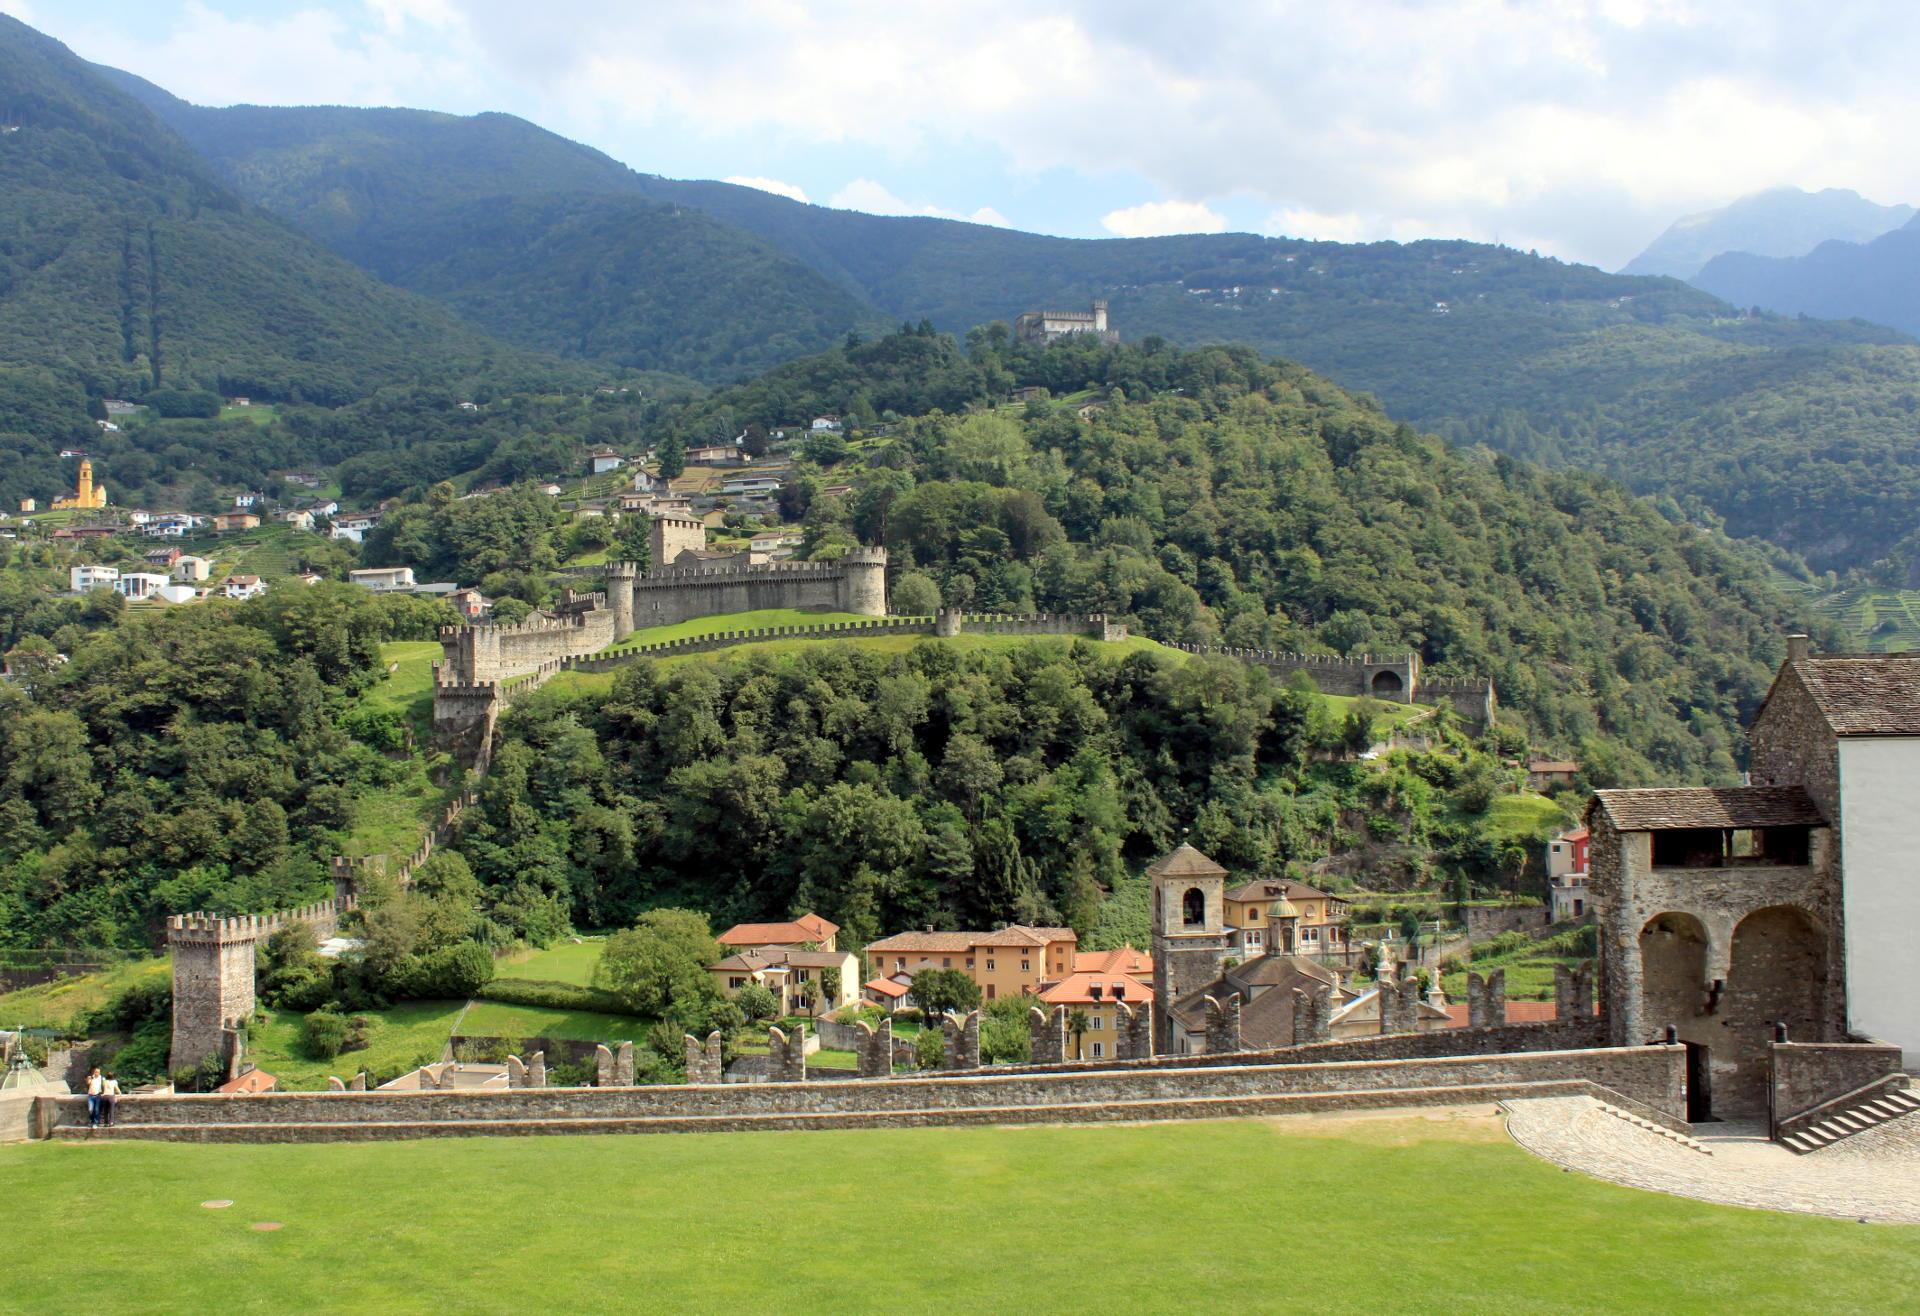 Bellinzona widok na miasto i zamki iglawpodrozy